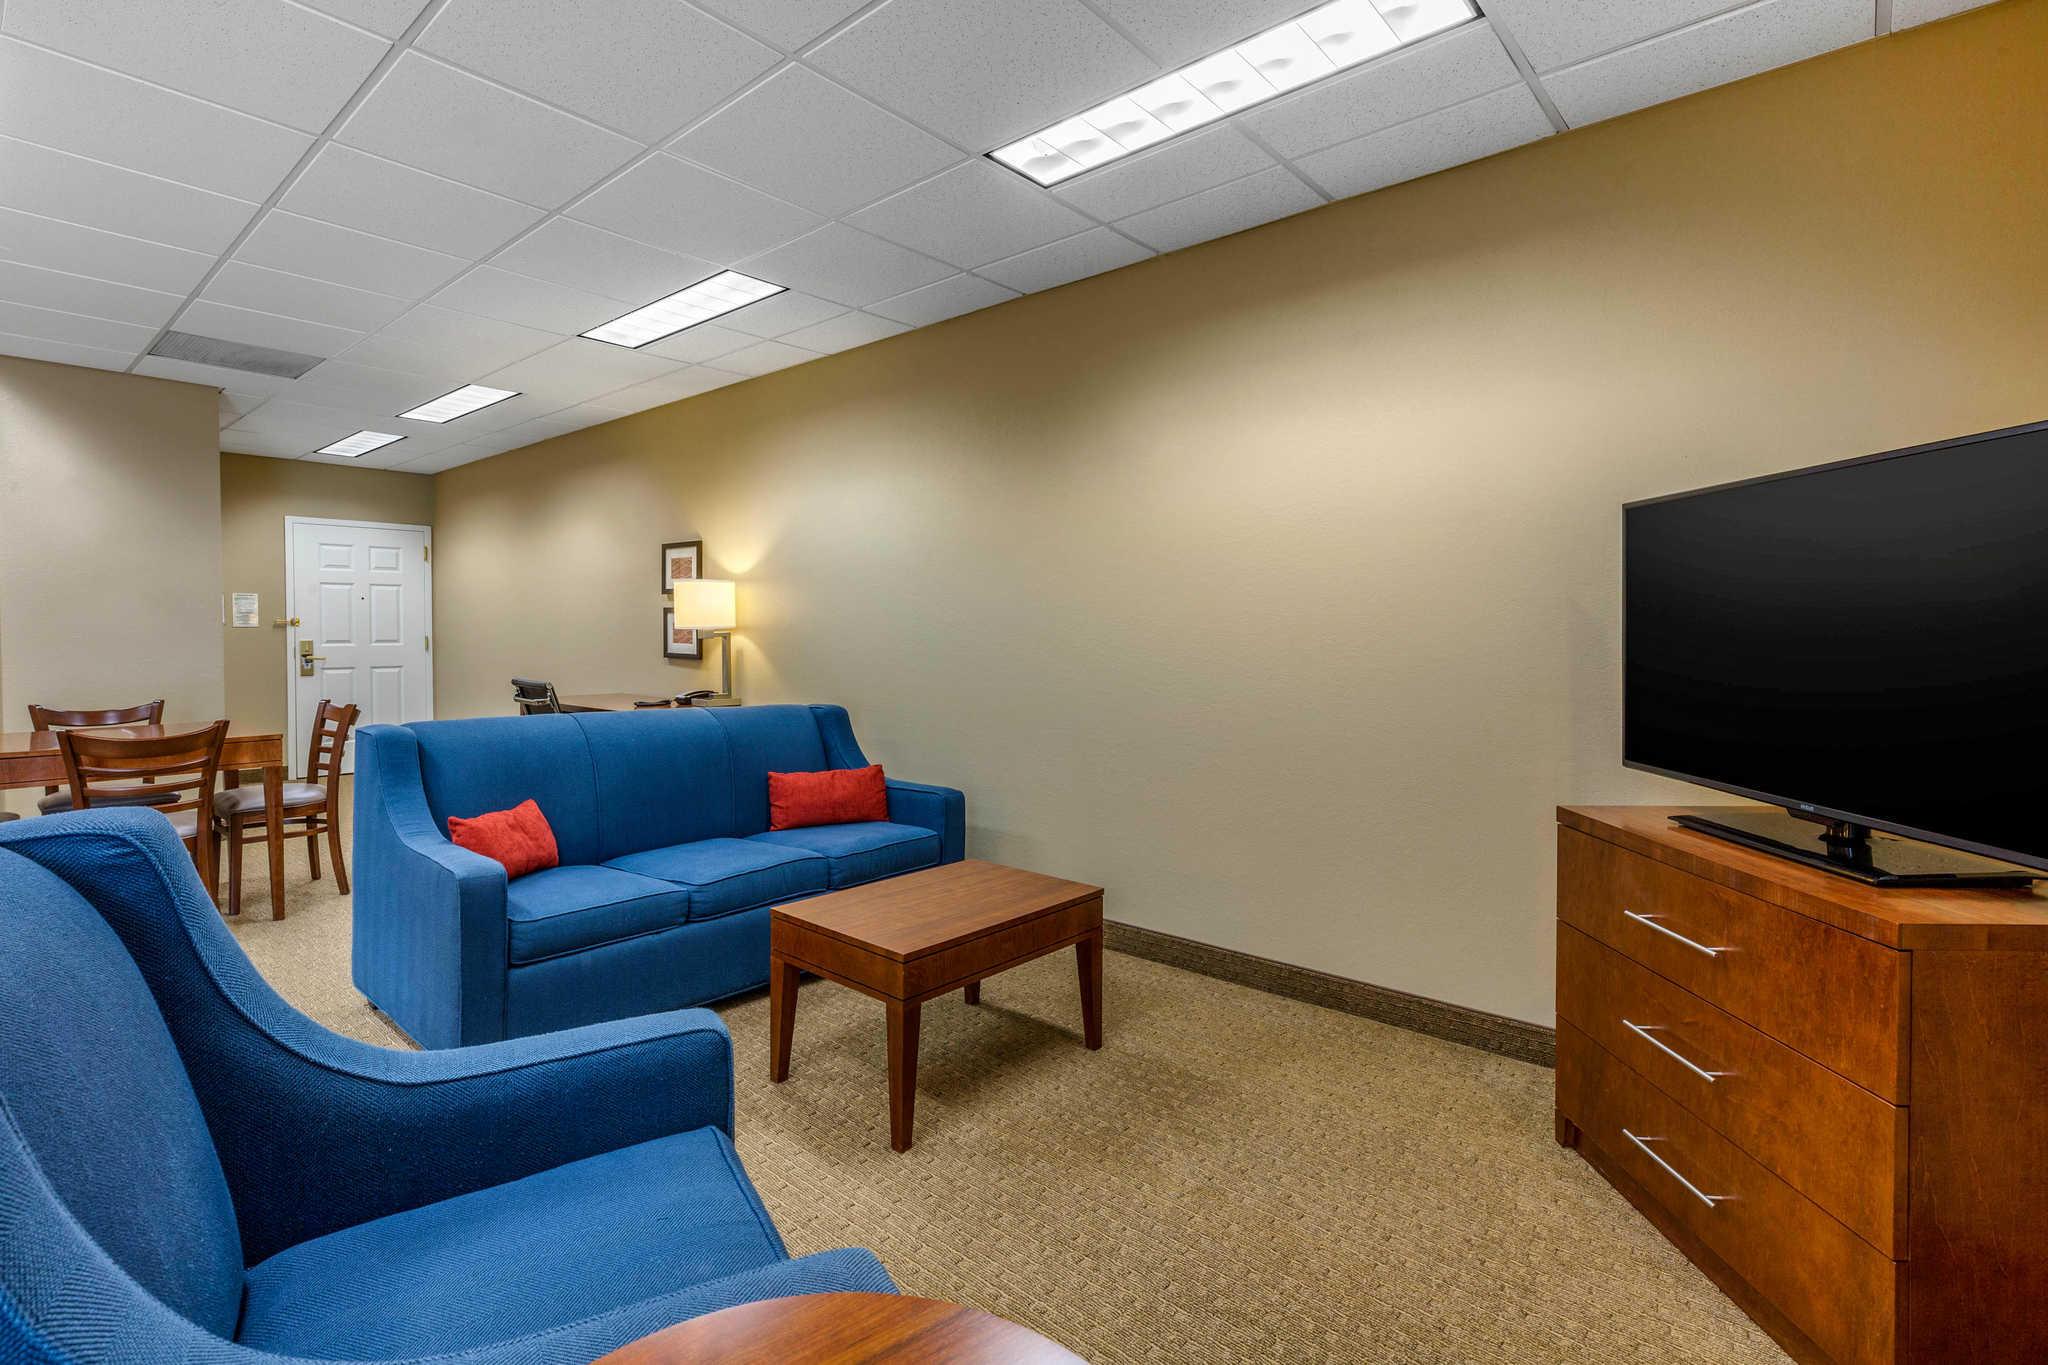 Comfort Inn & Suites image 24